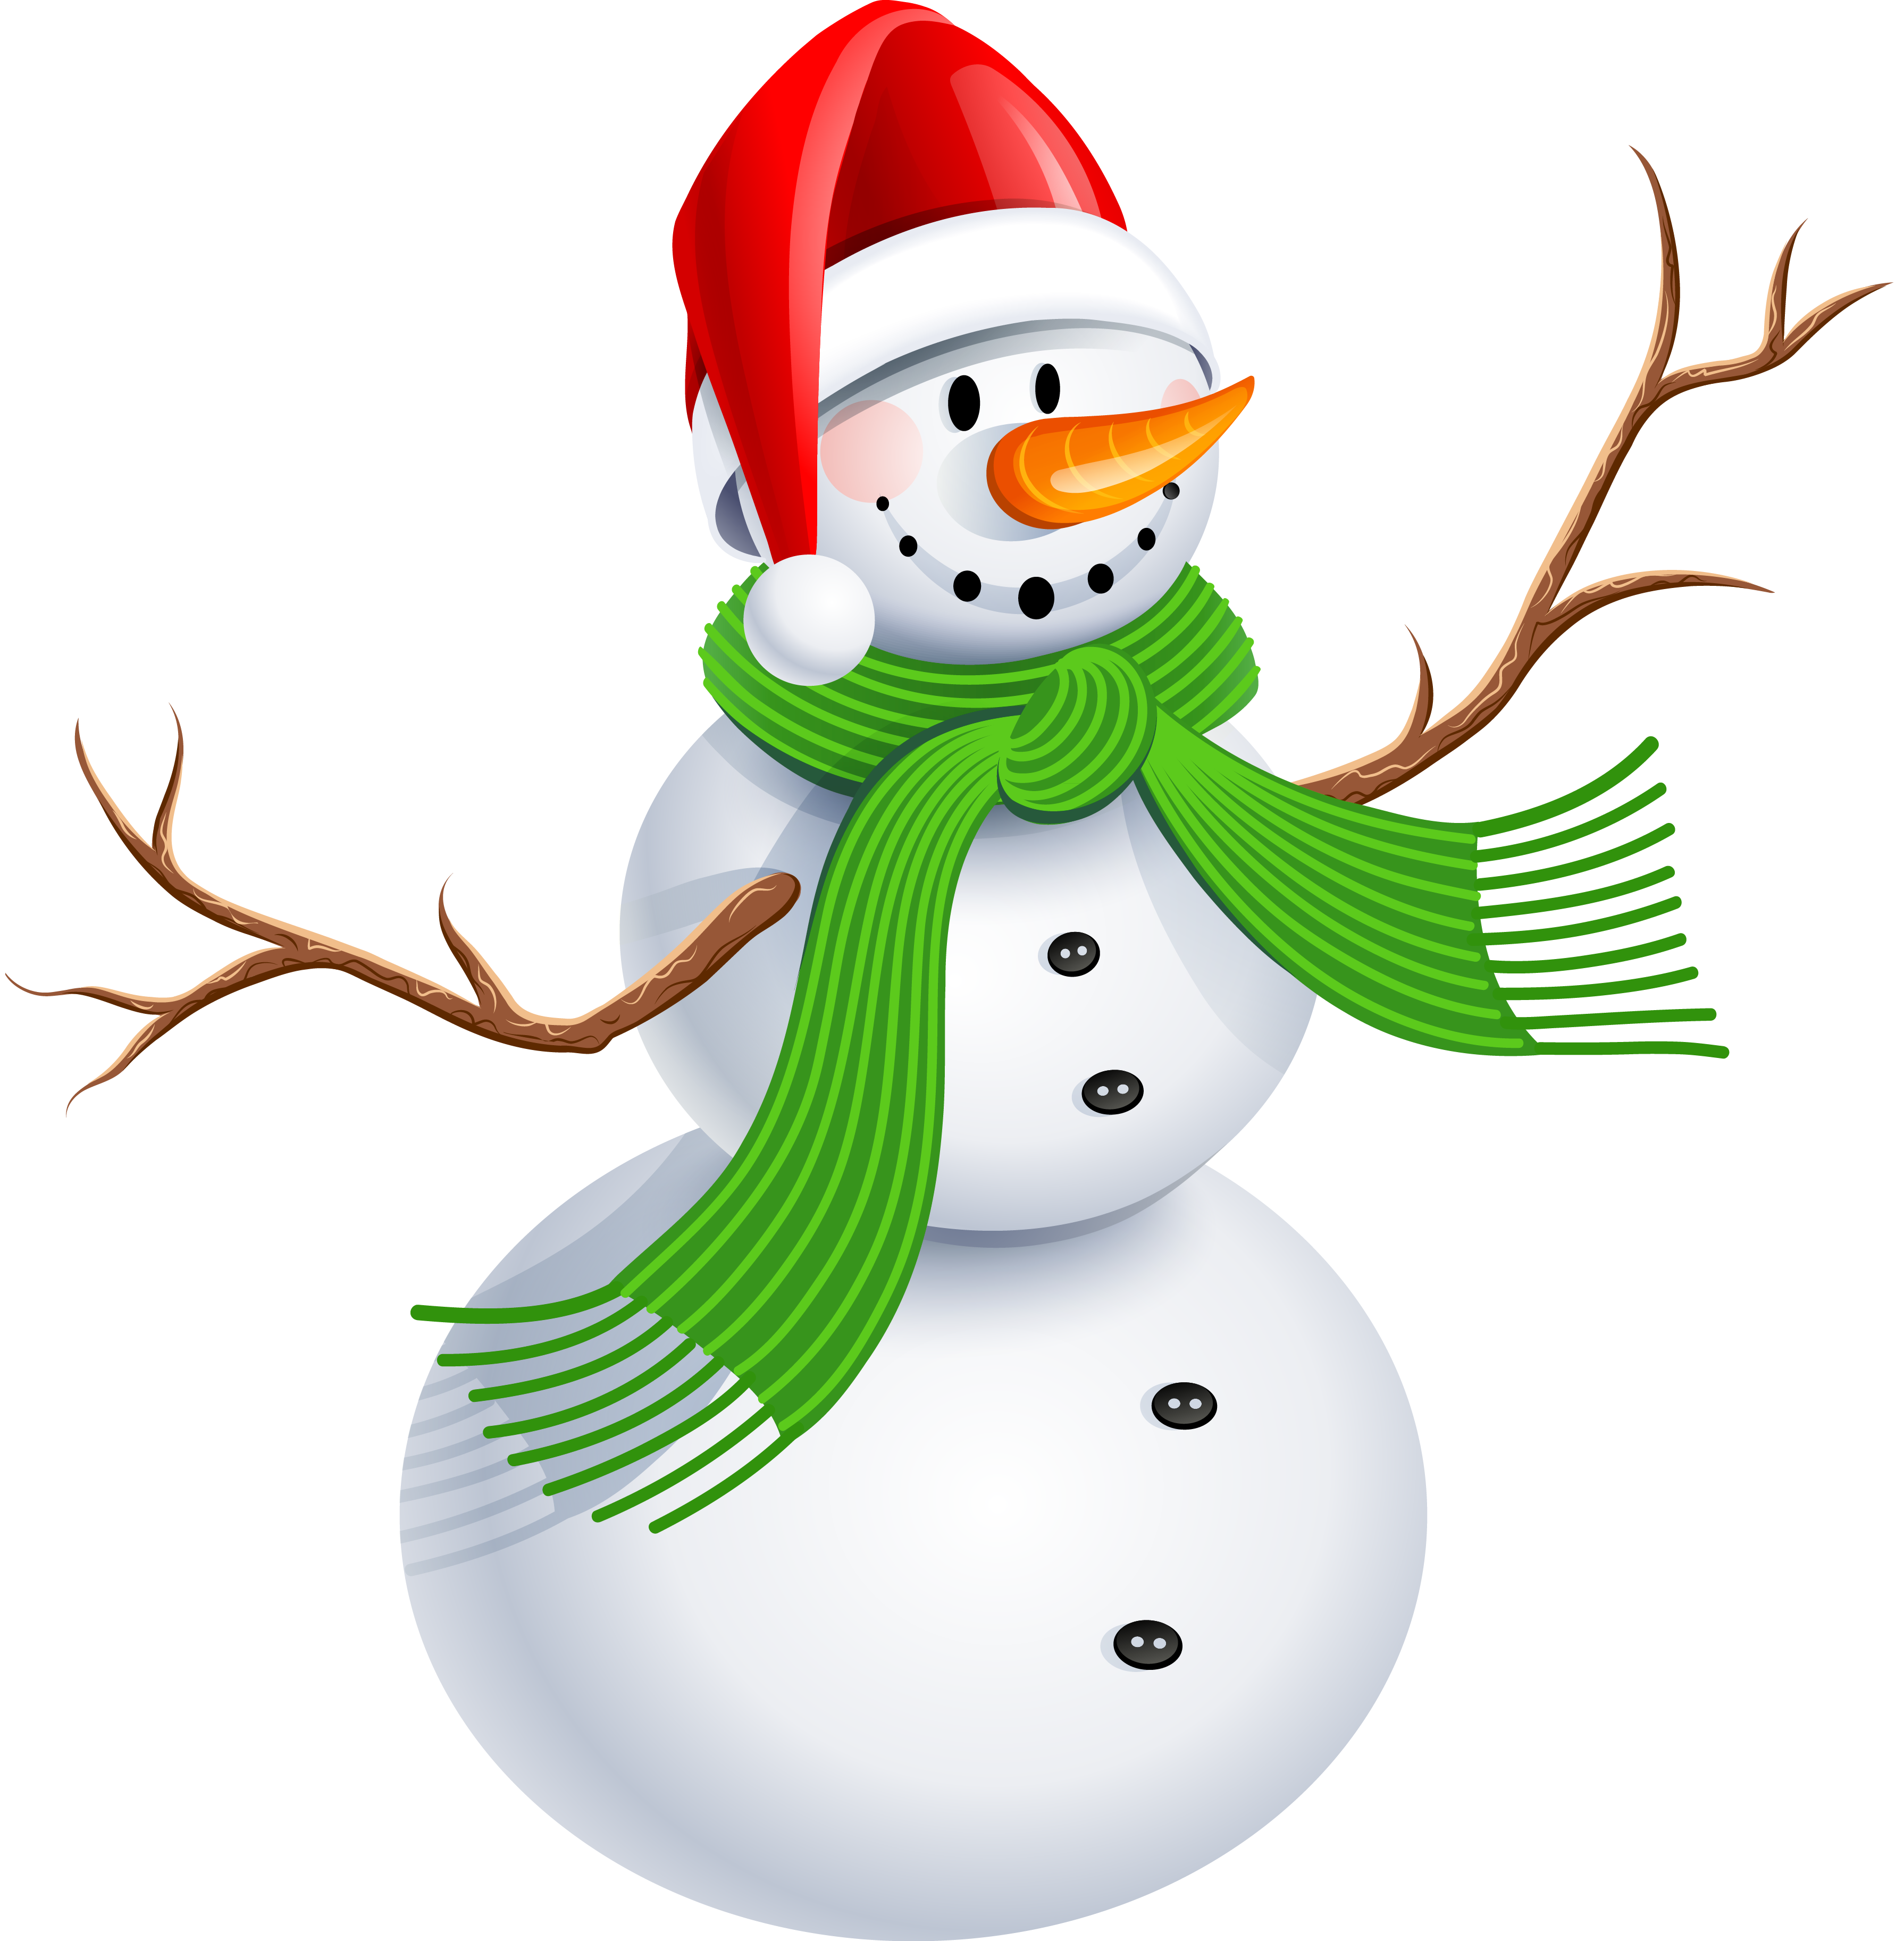 3581x3651 Scarf Clipart Snowman Scarf